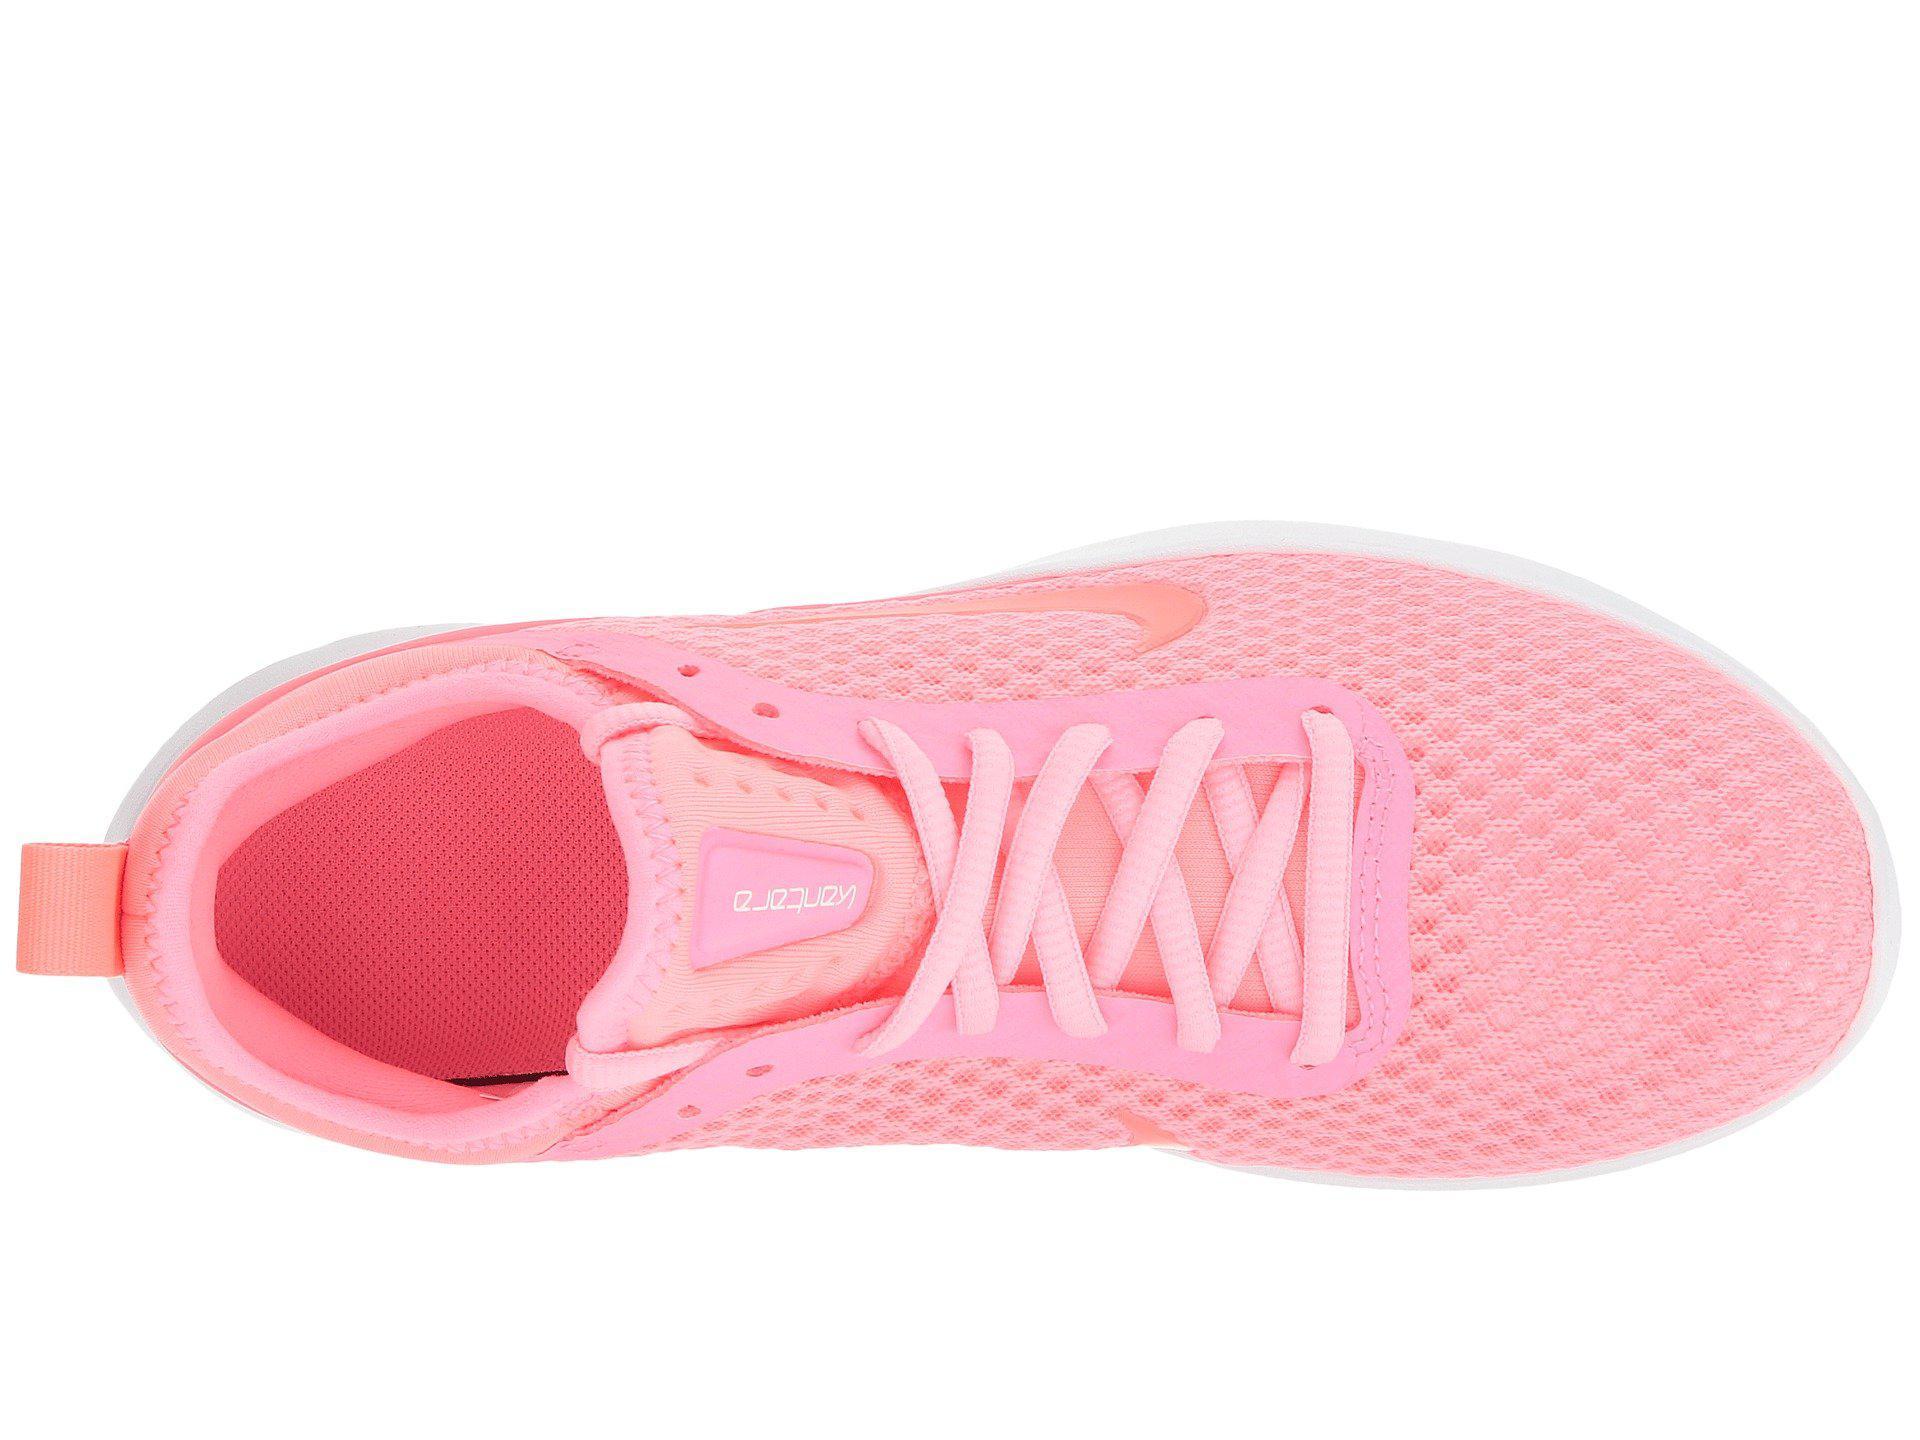 Nike Rubber Air Max Kantara in Pink - Lyst